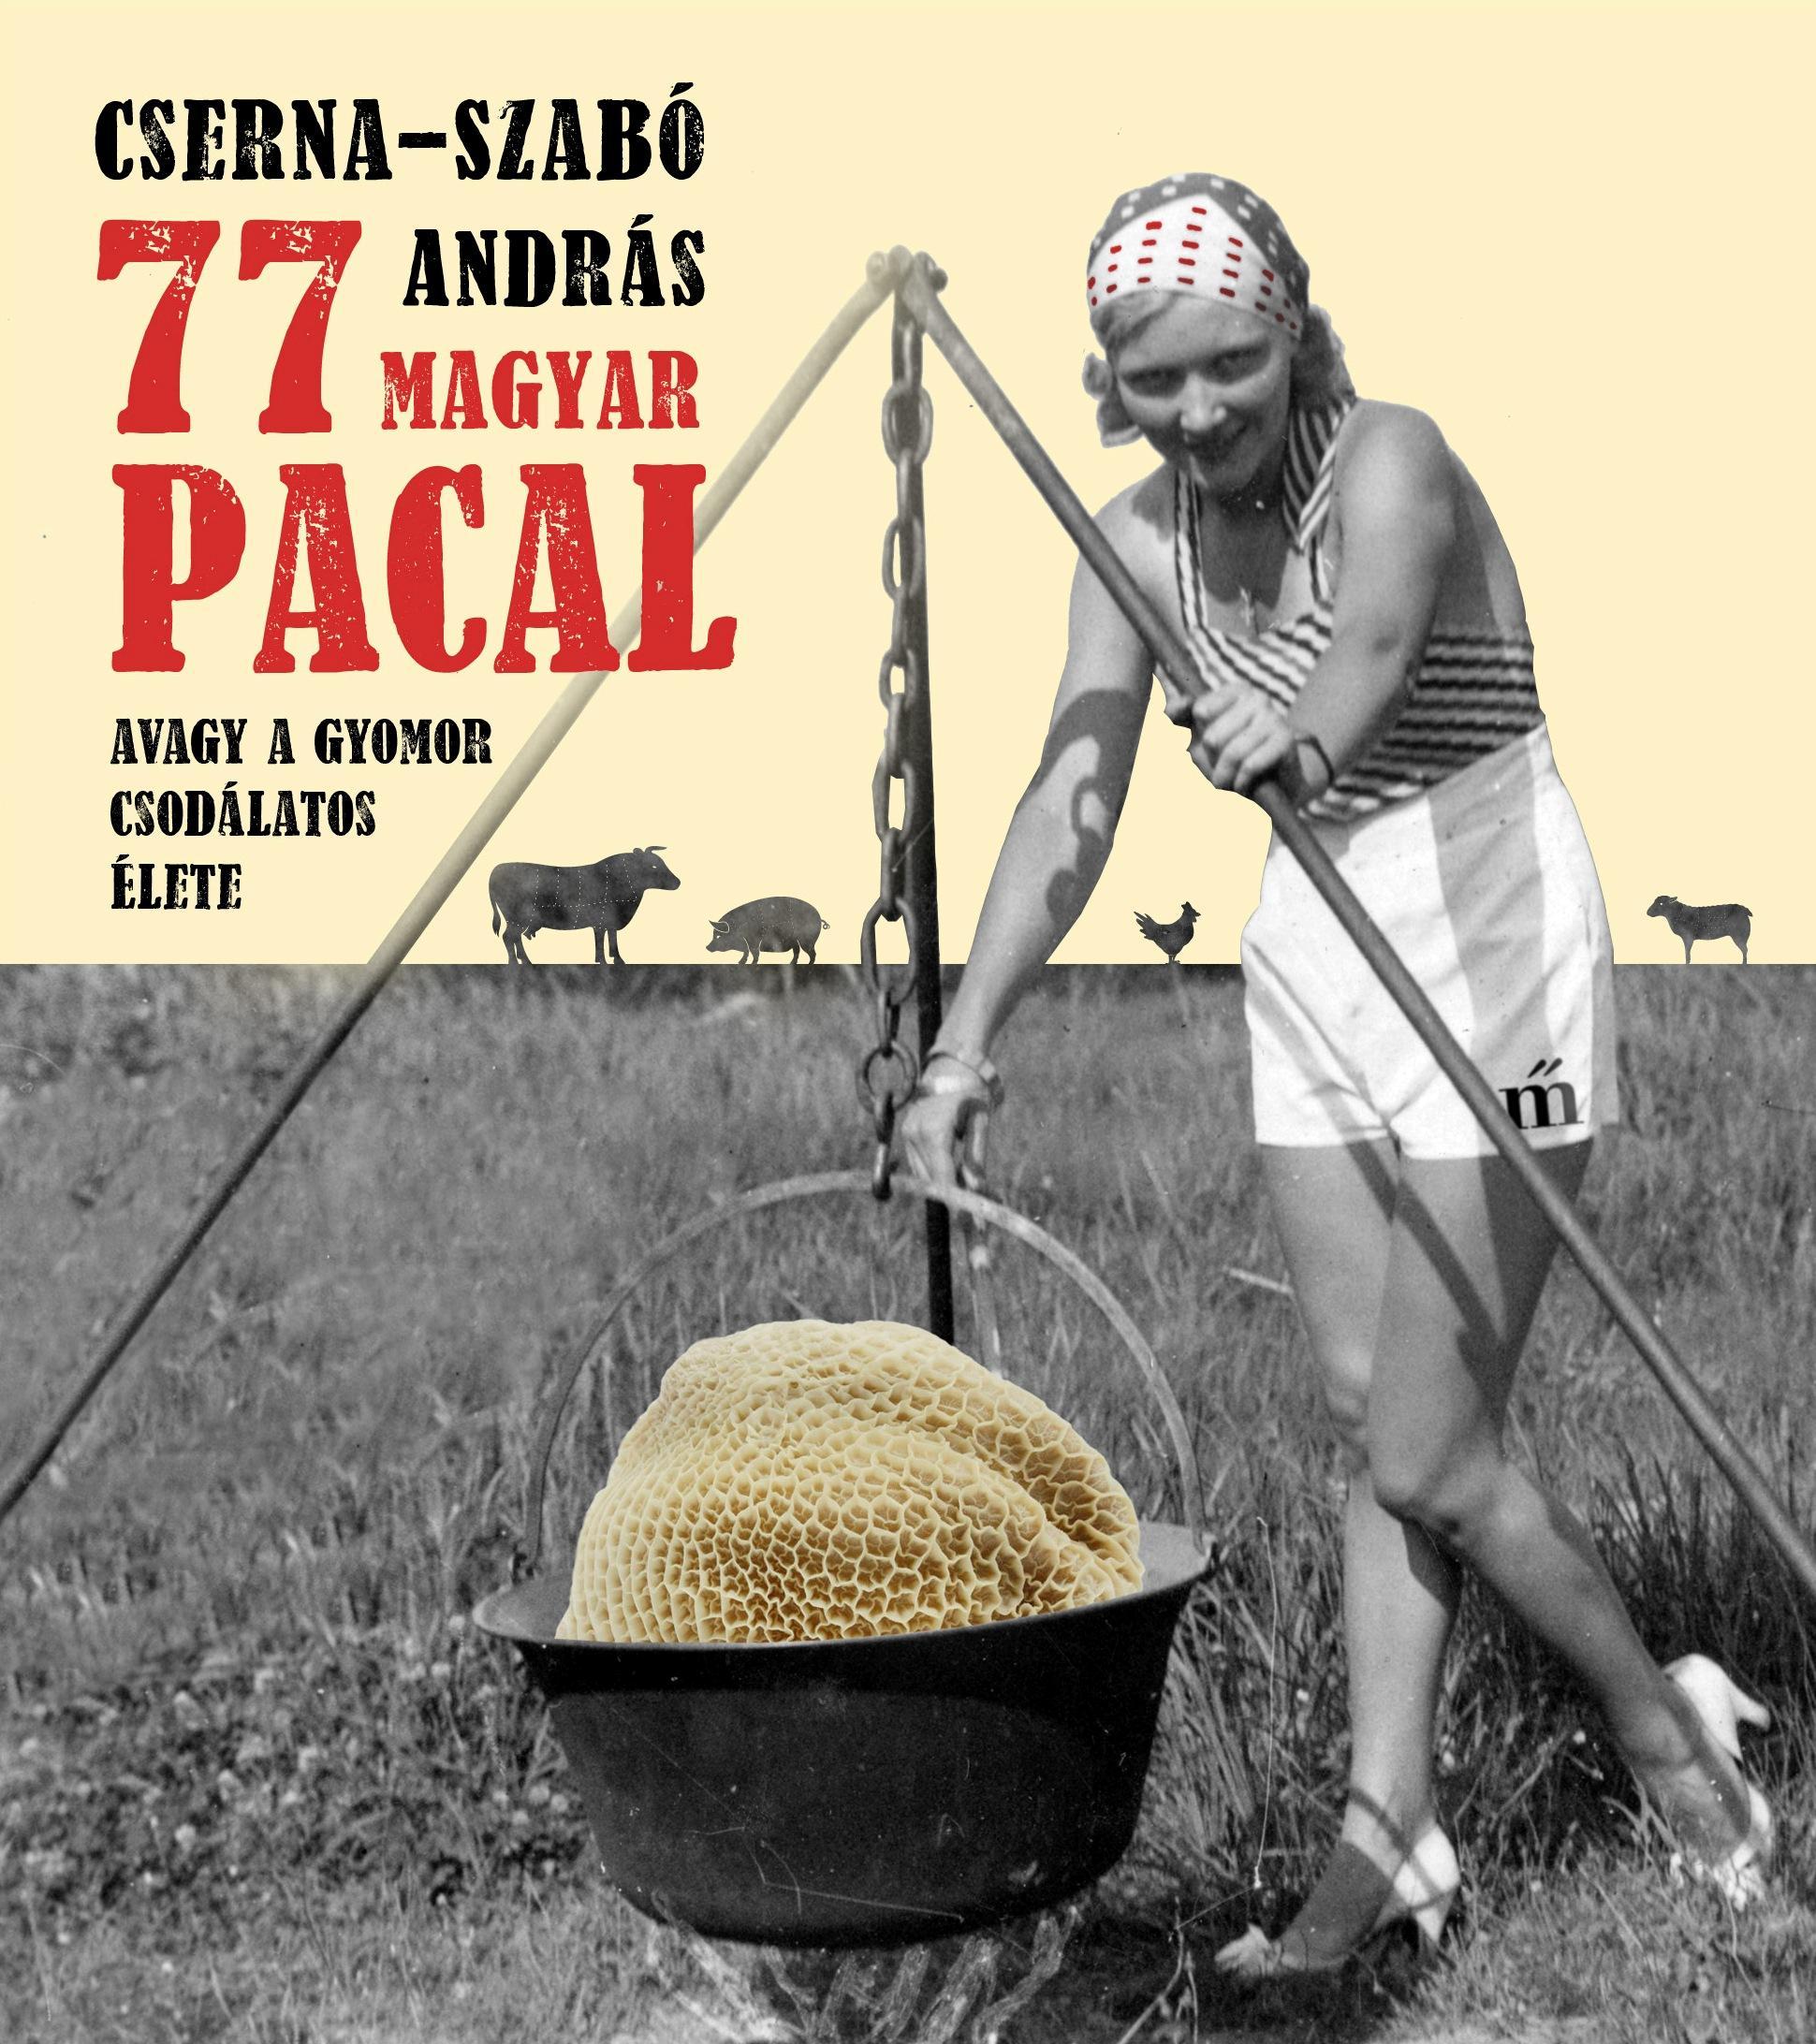 CSERNA-SZABÓ ANDRÁS - 77 MAGYAR PACAL